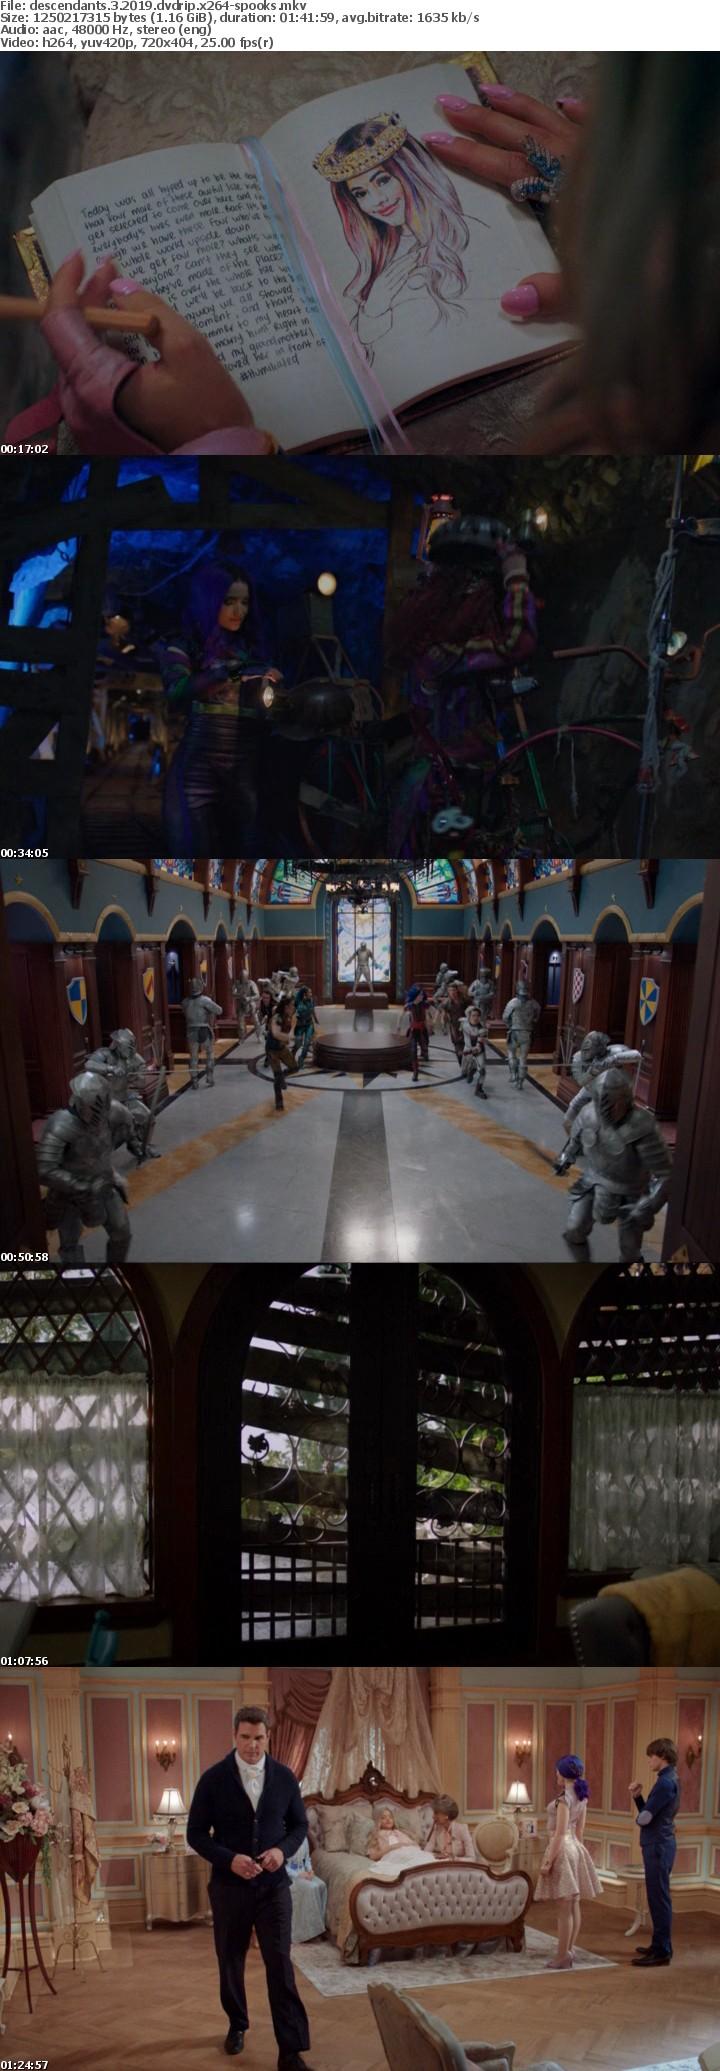 Descendants 3 2019 DVDRip x264-SPOOKS